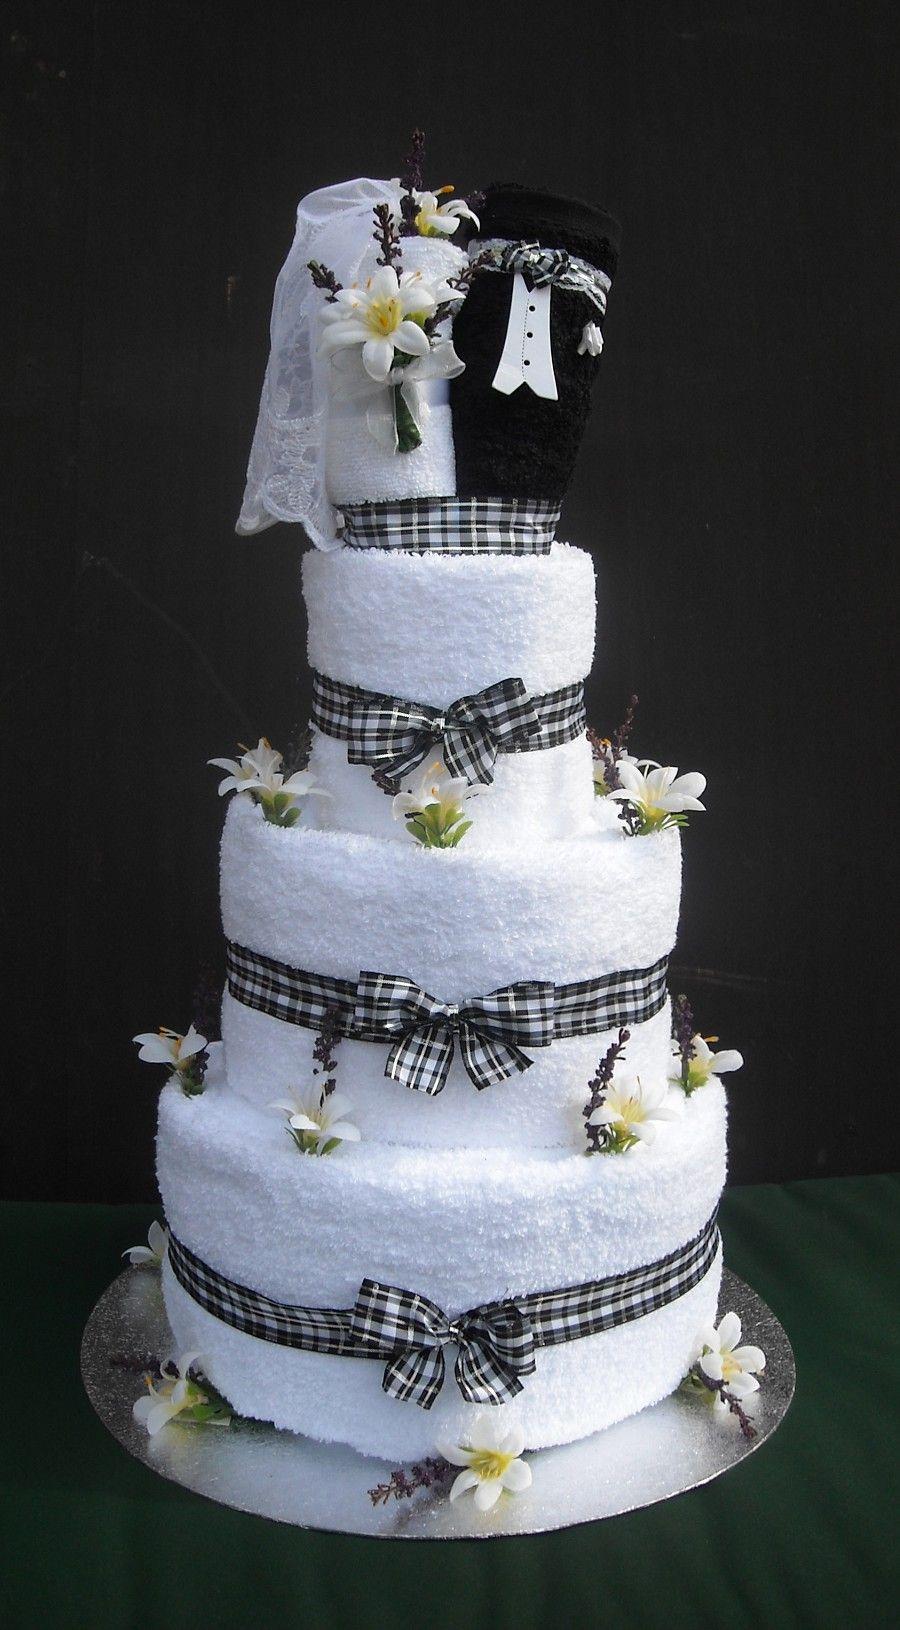 Wedding Towel Cake Bride And Groom Wedding Towel Cake With